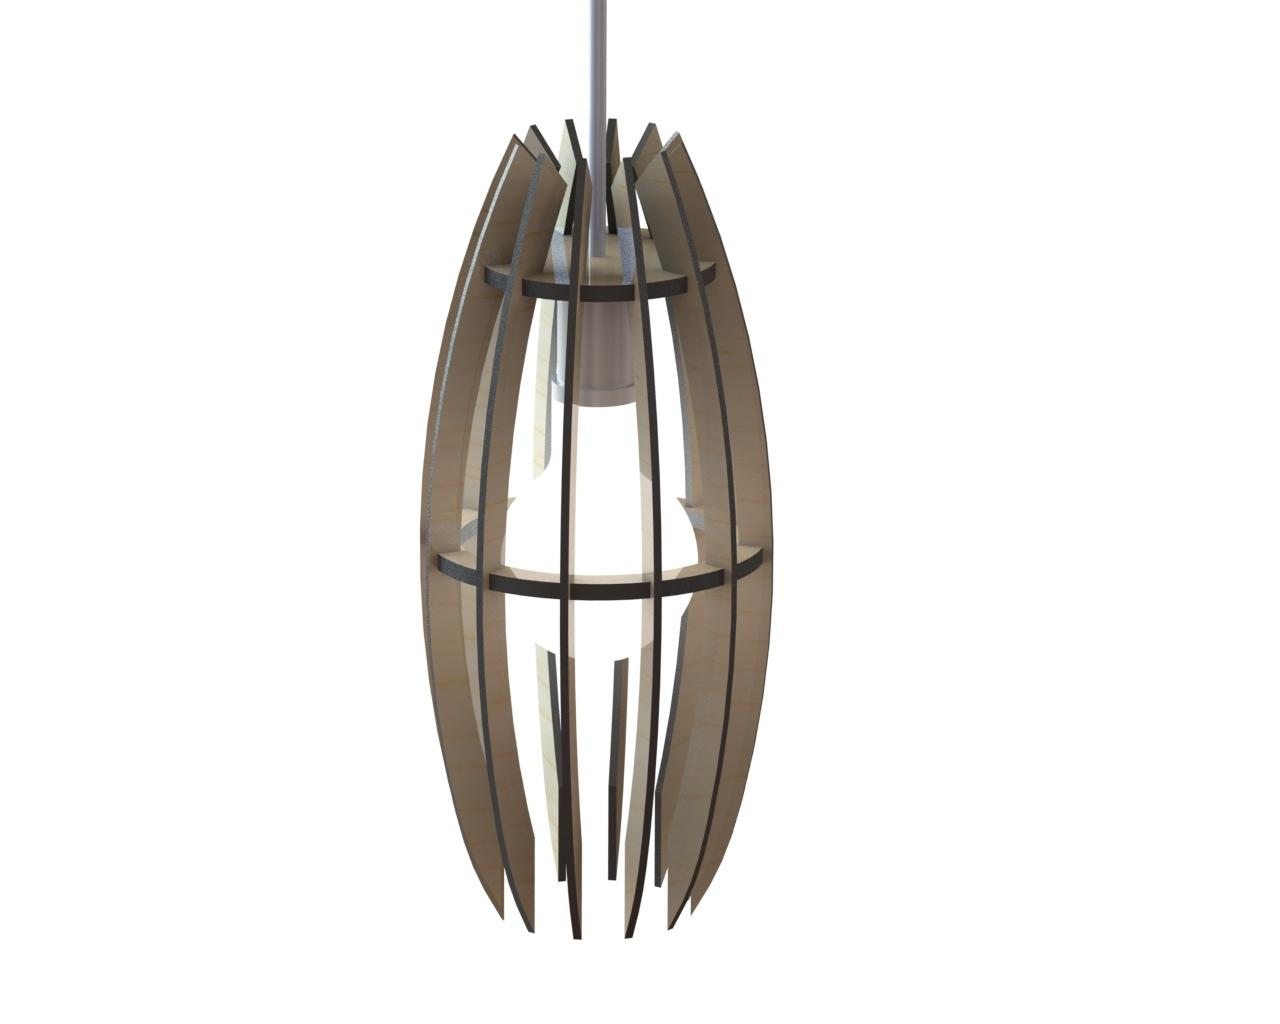 Laser Cut Lamp 13 Template Free CDR Vectors Art